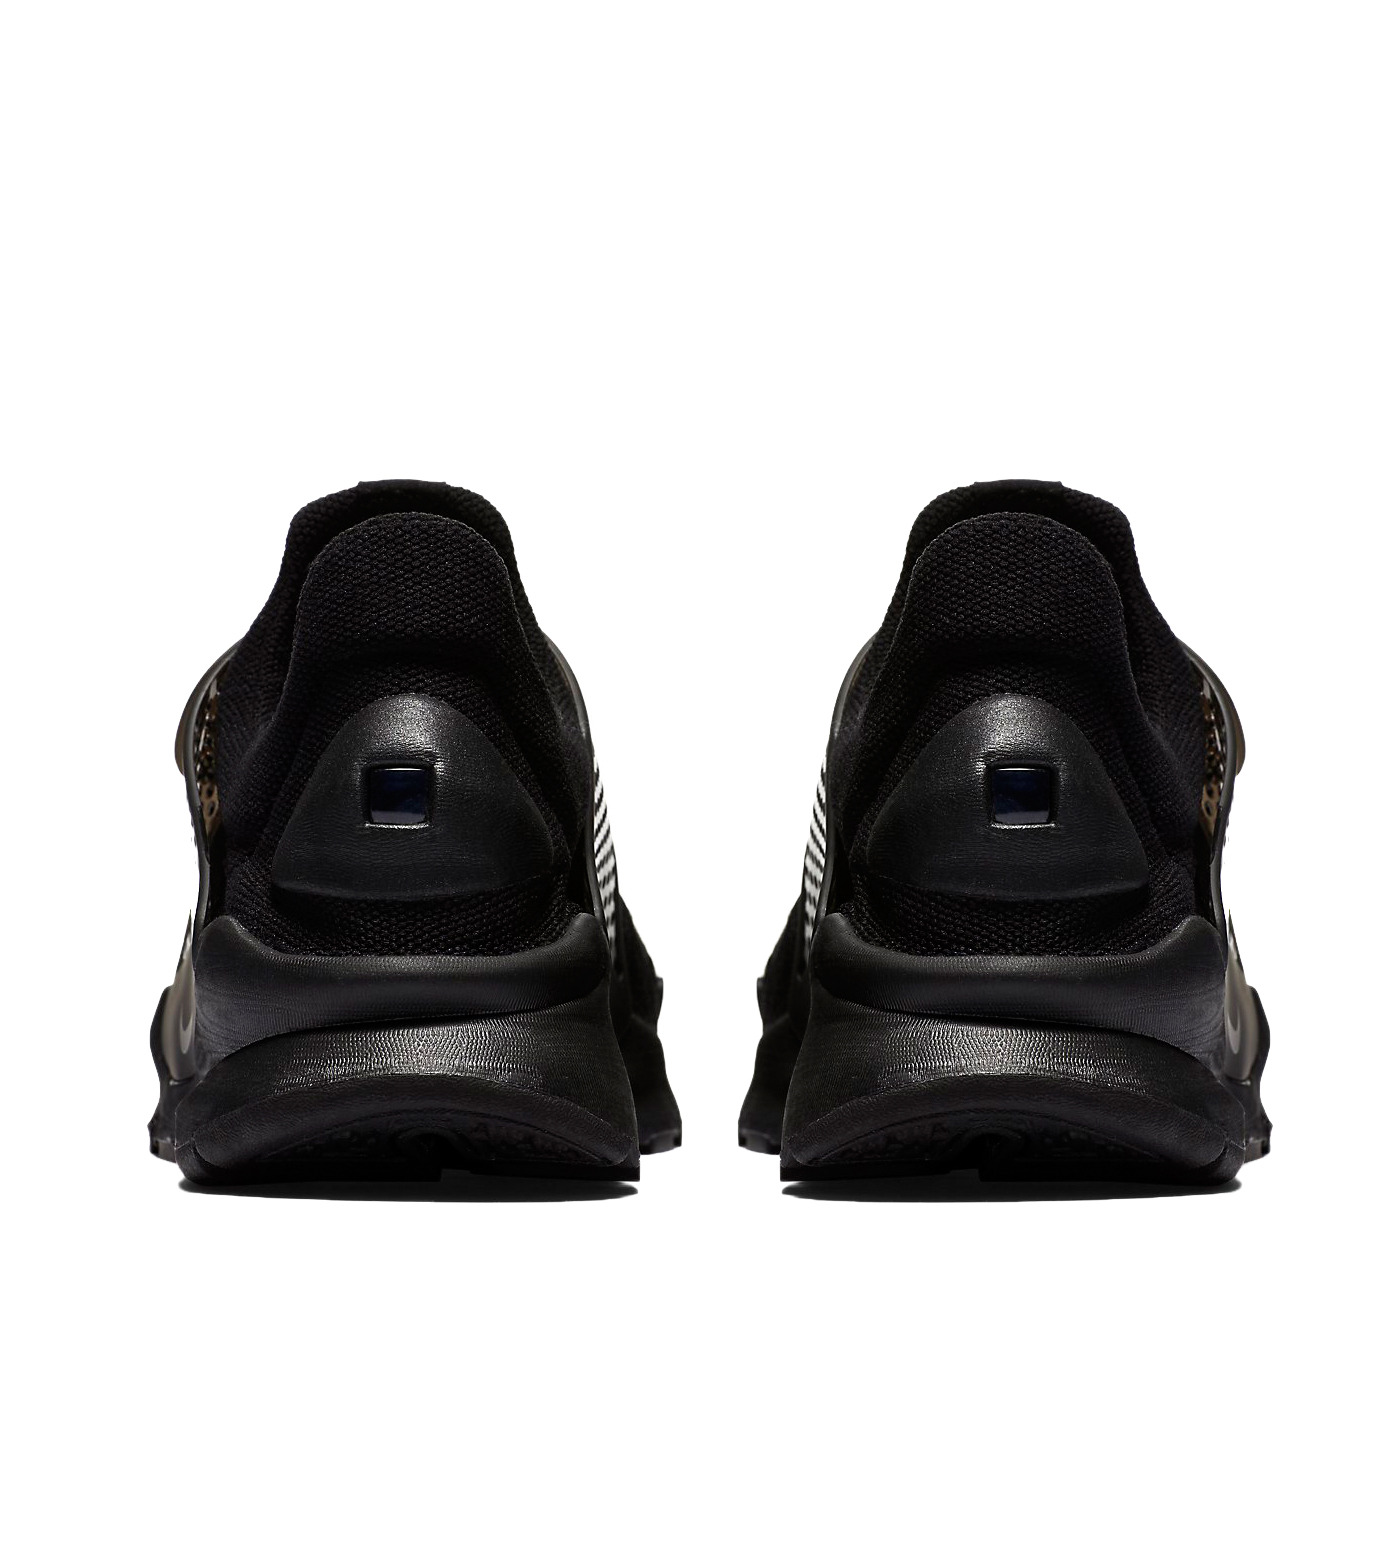 NIKE(ナイキ)のSOCK DART-BLACK(シューズ/shoes)-819686-001-13 拡大詳細画像5